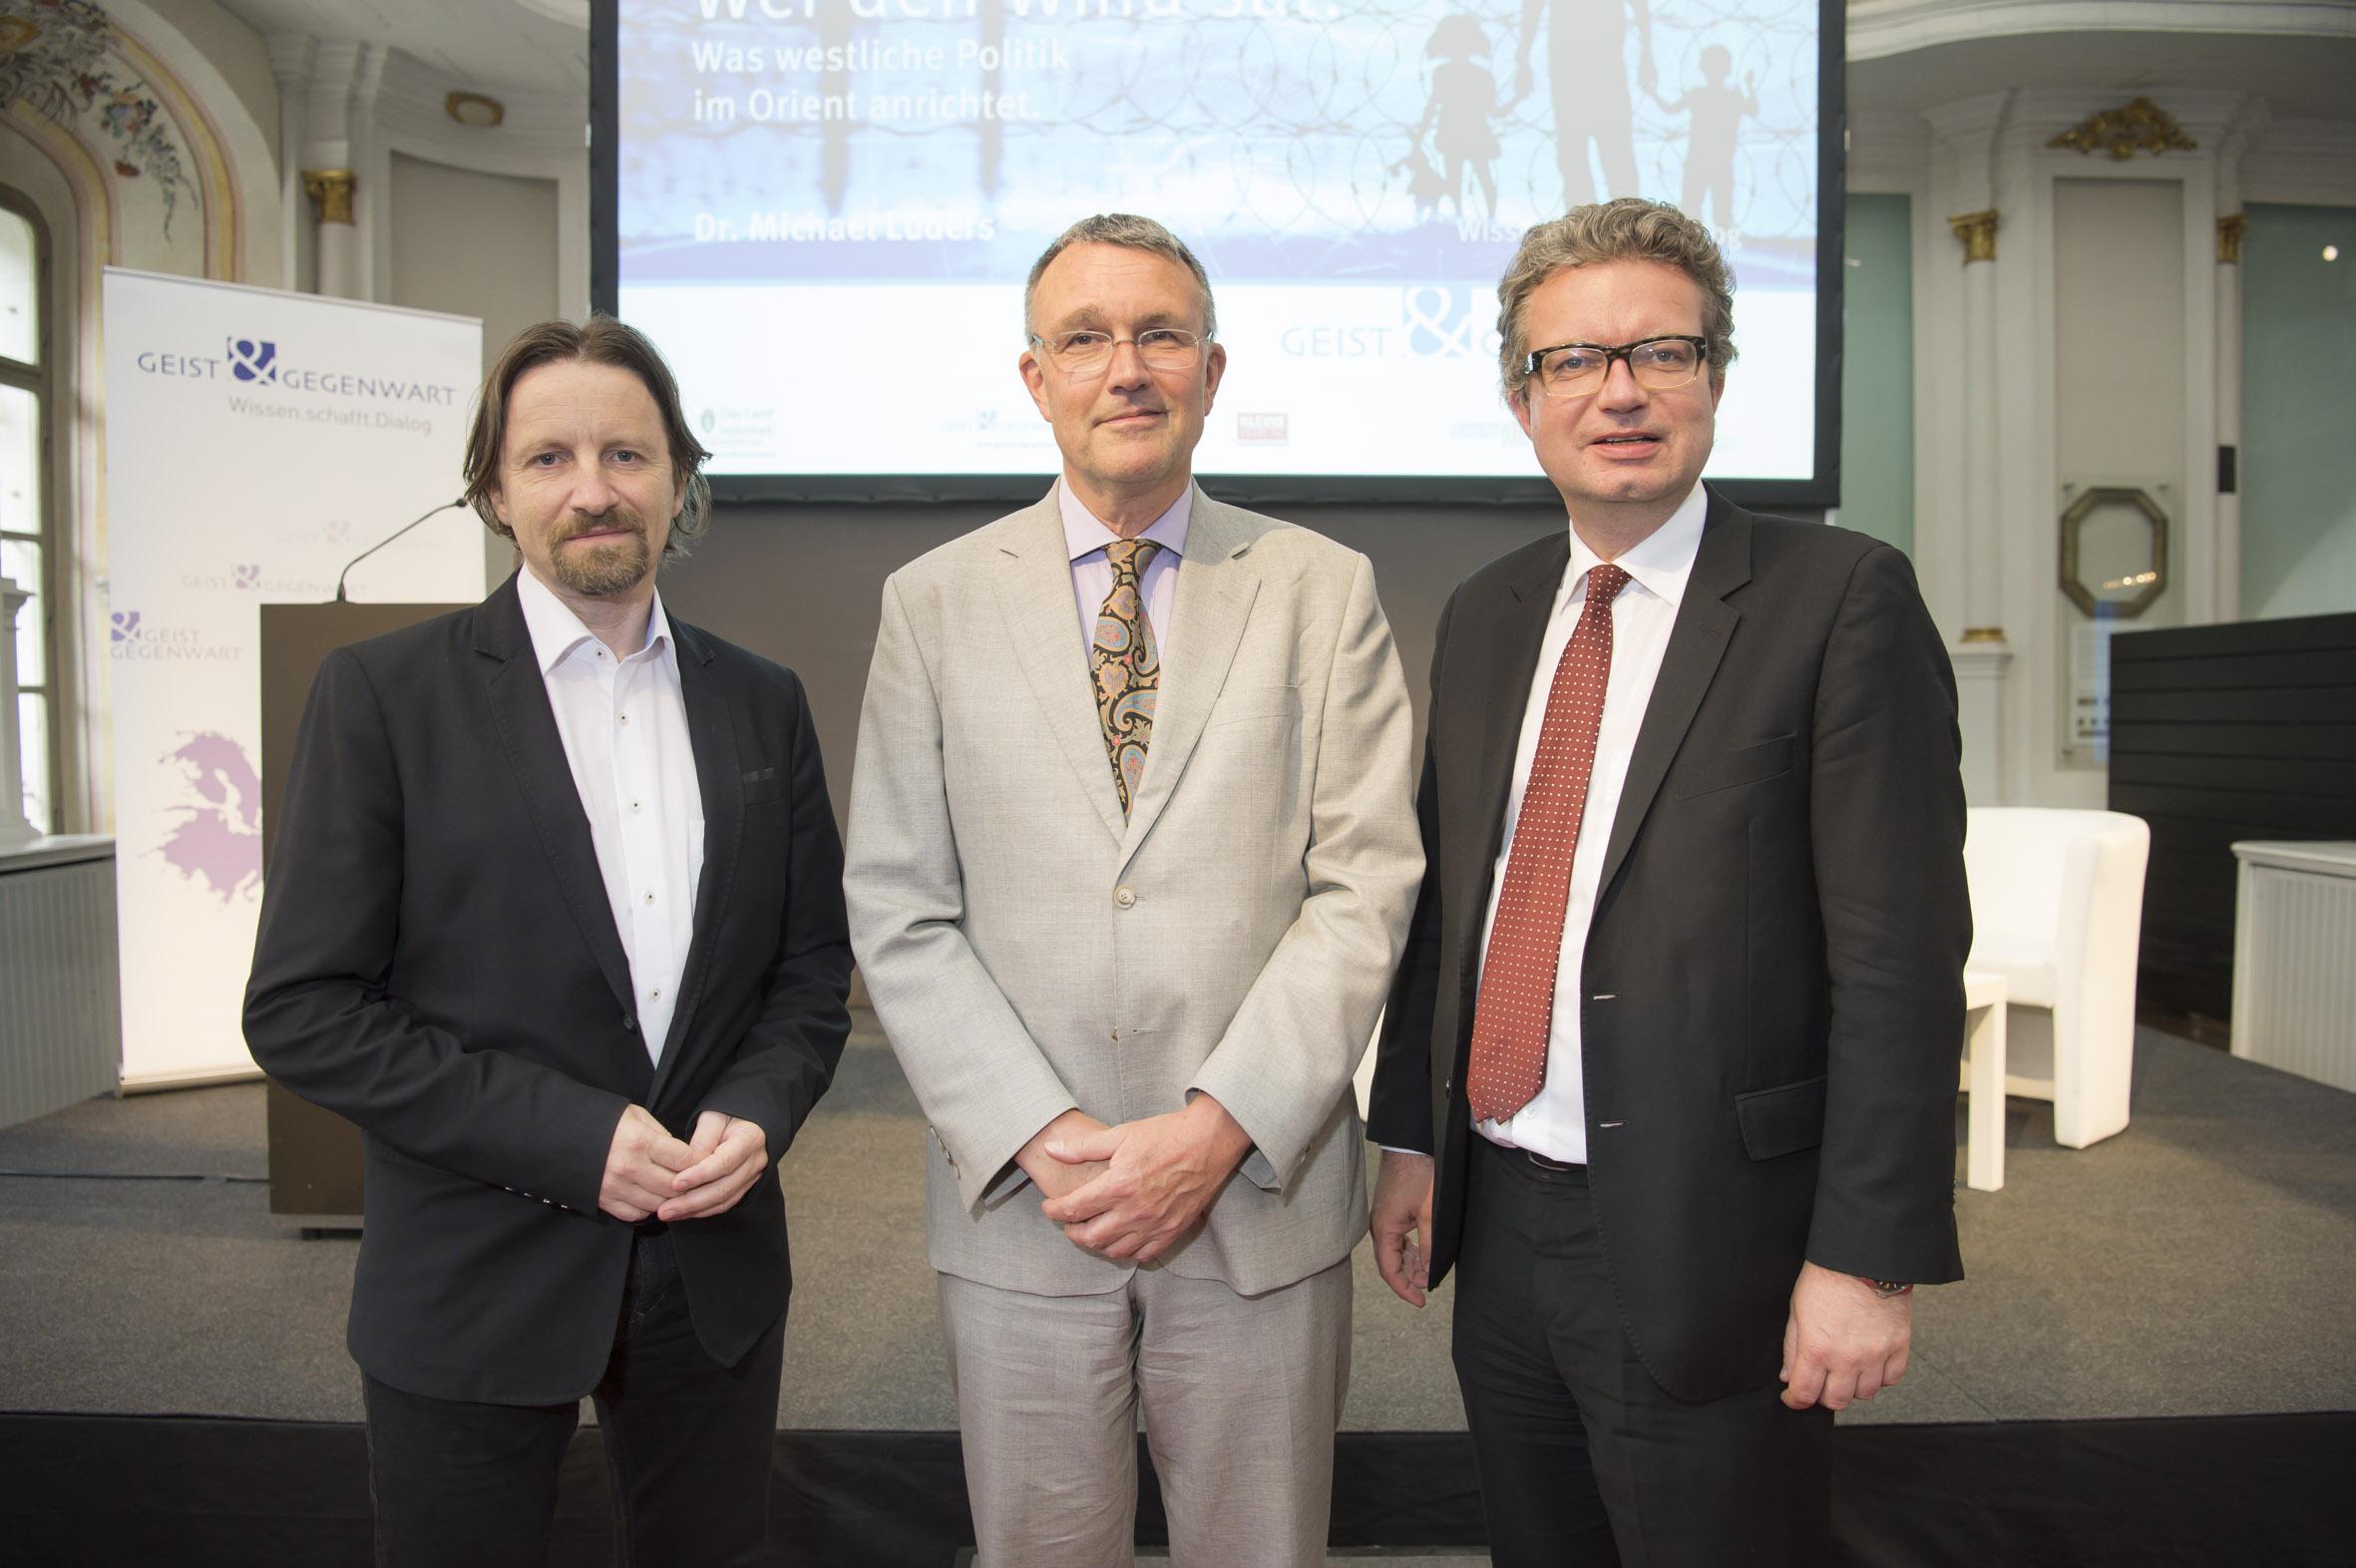 Dr. Ernst Sittinger, Dr. Michael Lüders ,Wissenschaftslandesrat Mag. Christopher Drexler Credit: Thomas Fischer